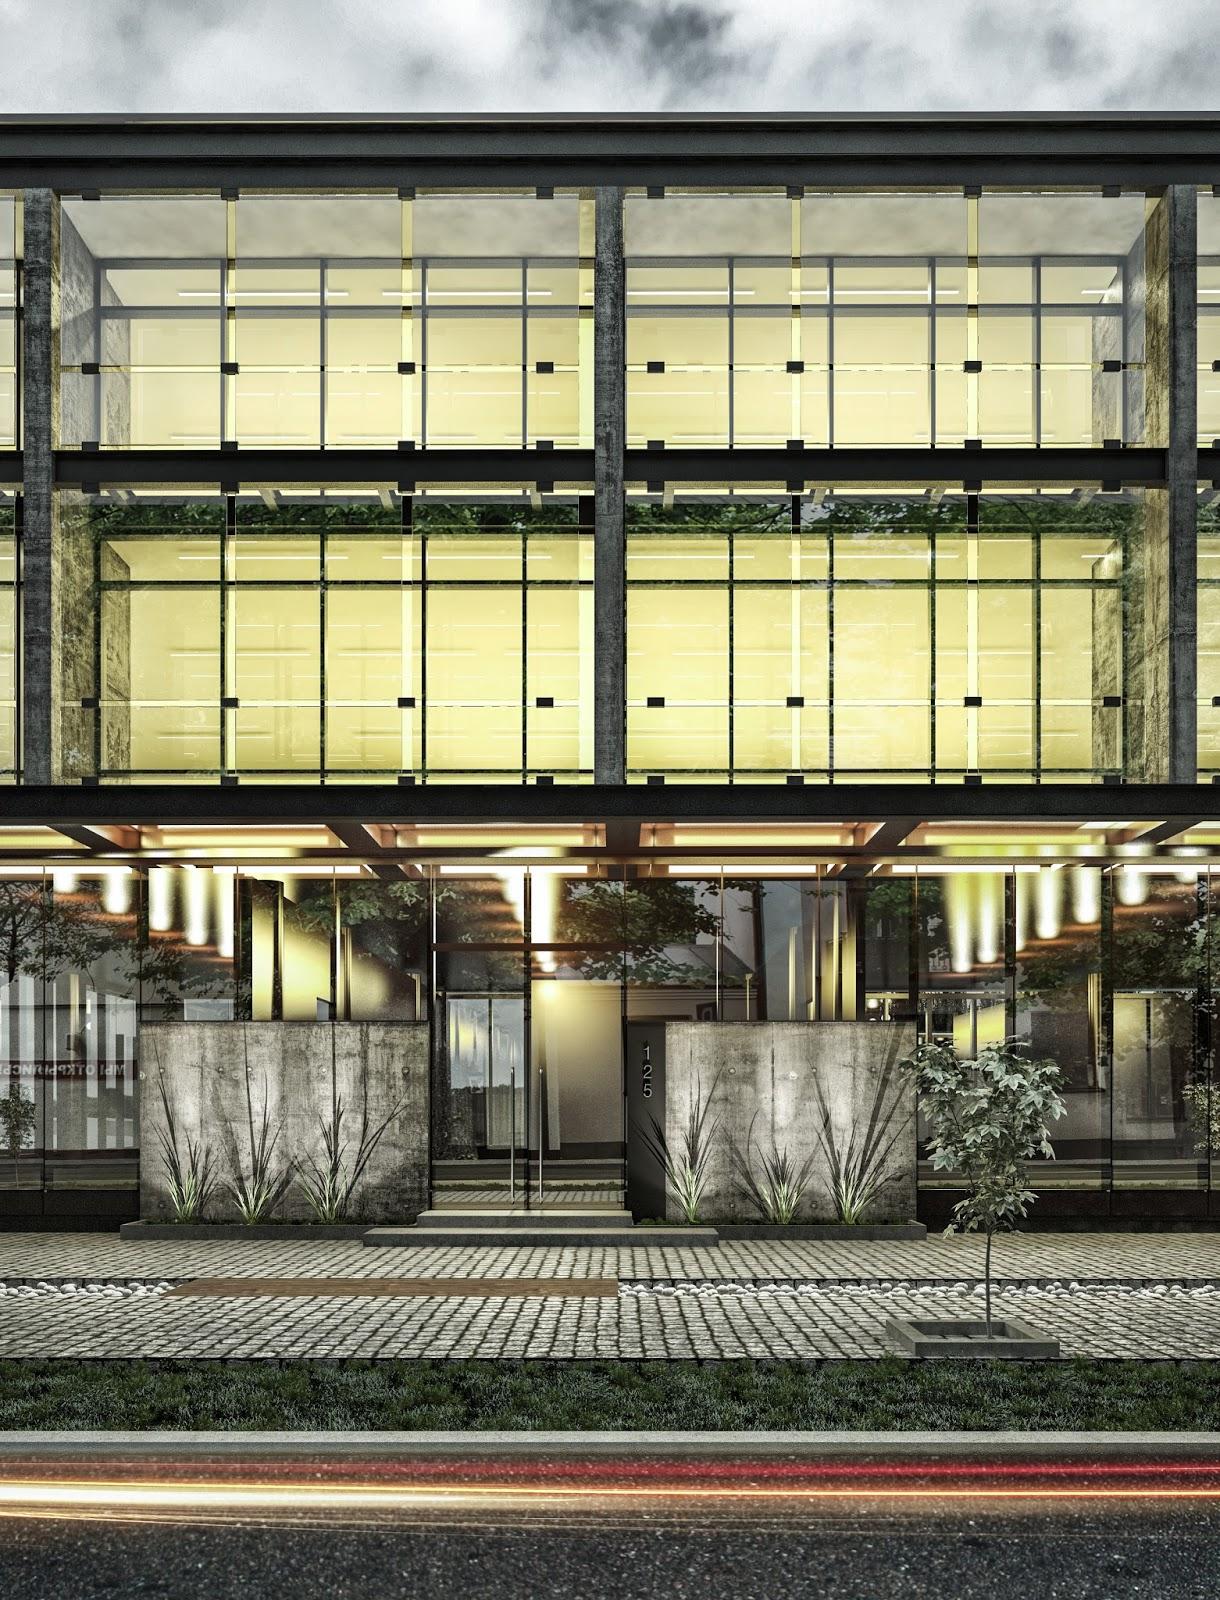 Haarchitect Проект Бизнесцентра в городе Бресте по ул